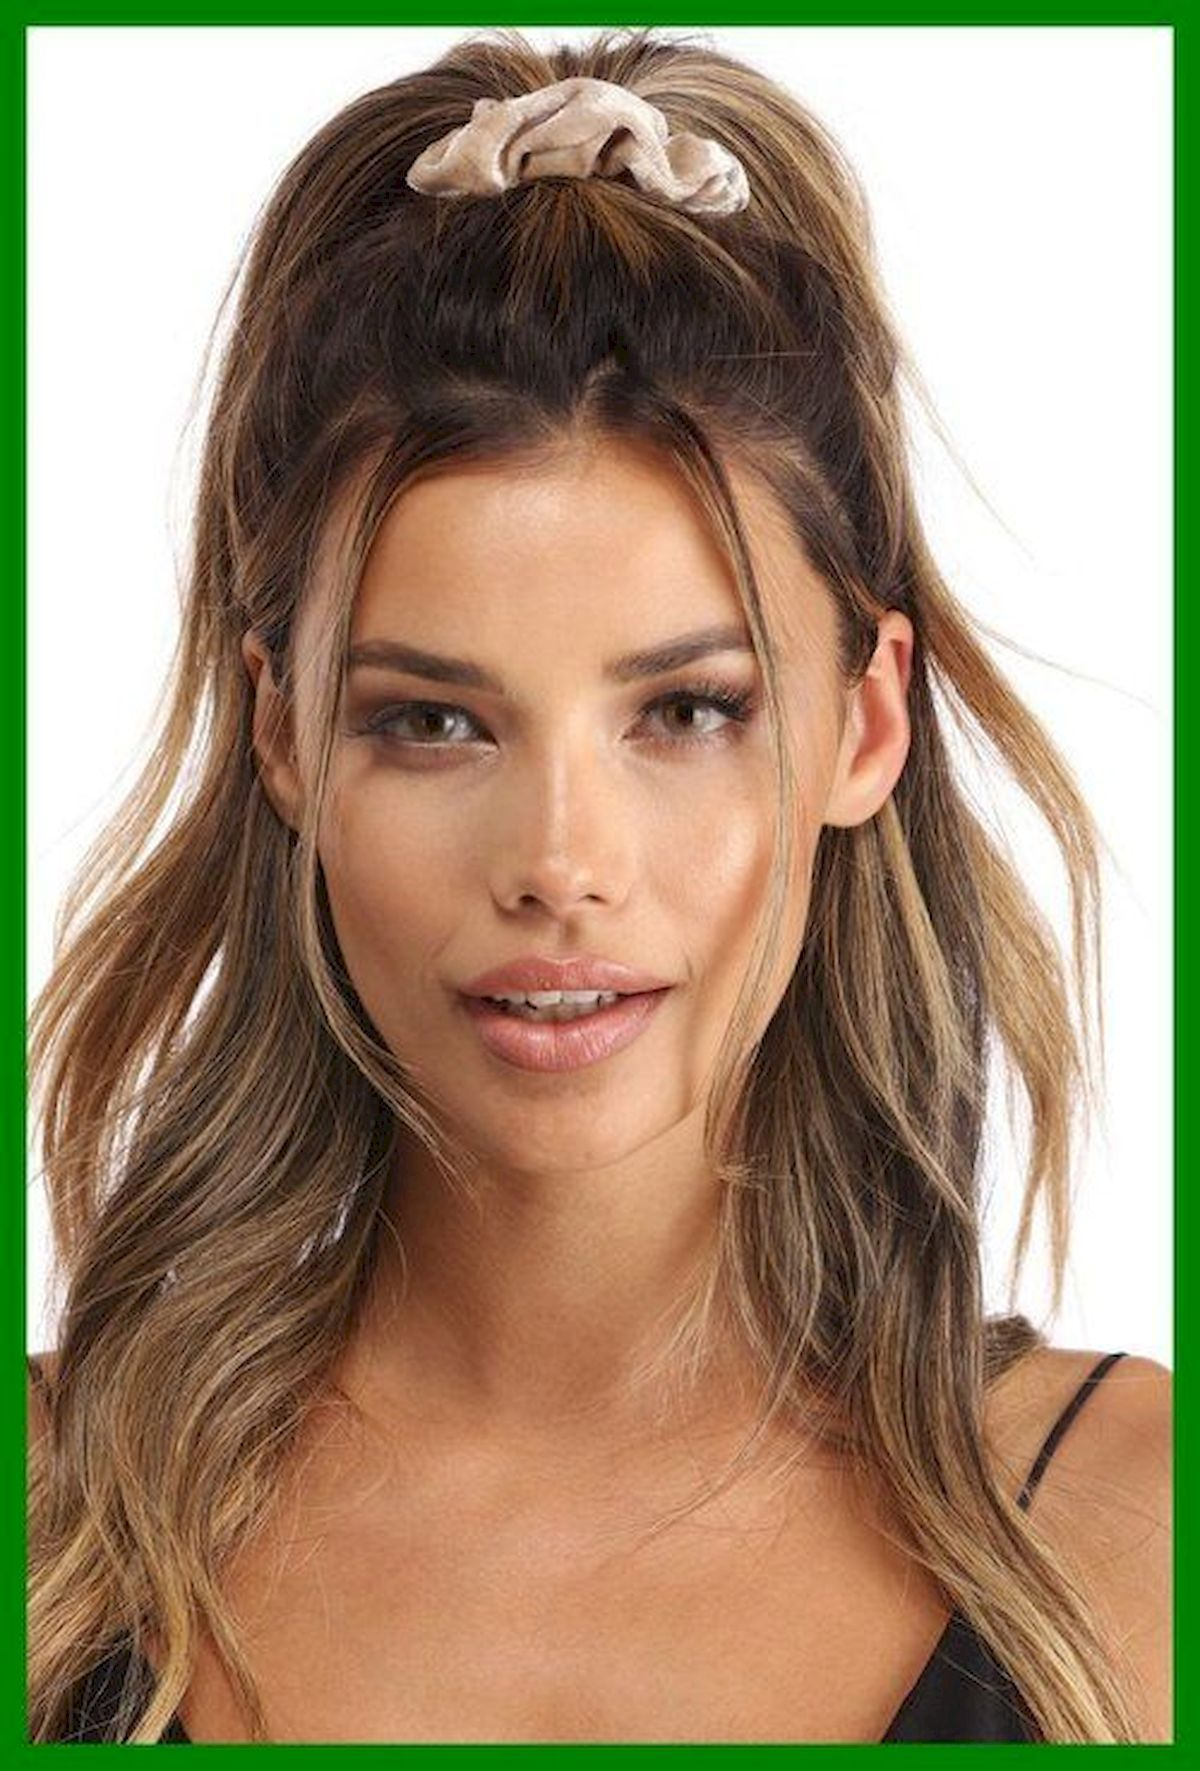 100 Best Easy Hairstyles Ideas Hair 90s Hairstyles Hair Styles In 2020 Easy Hairstyles Hair Styles Long Hair Styles